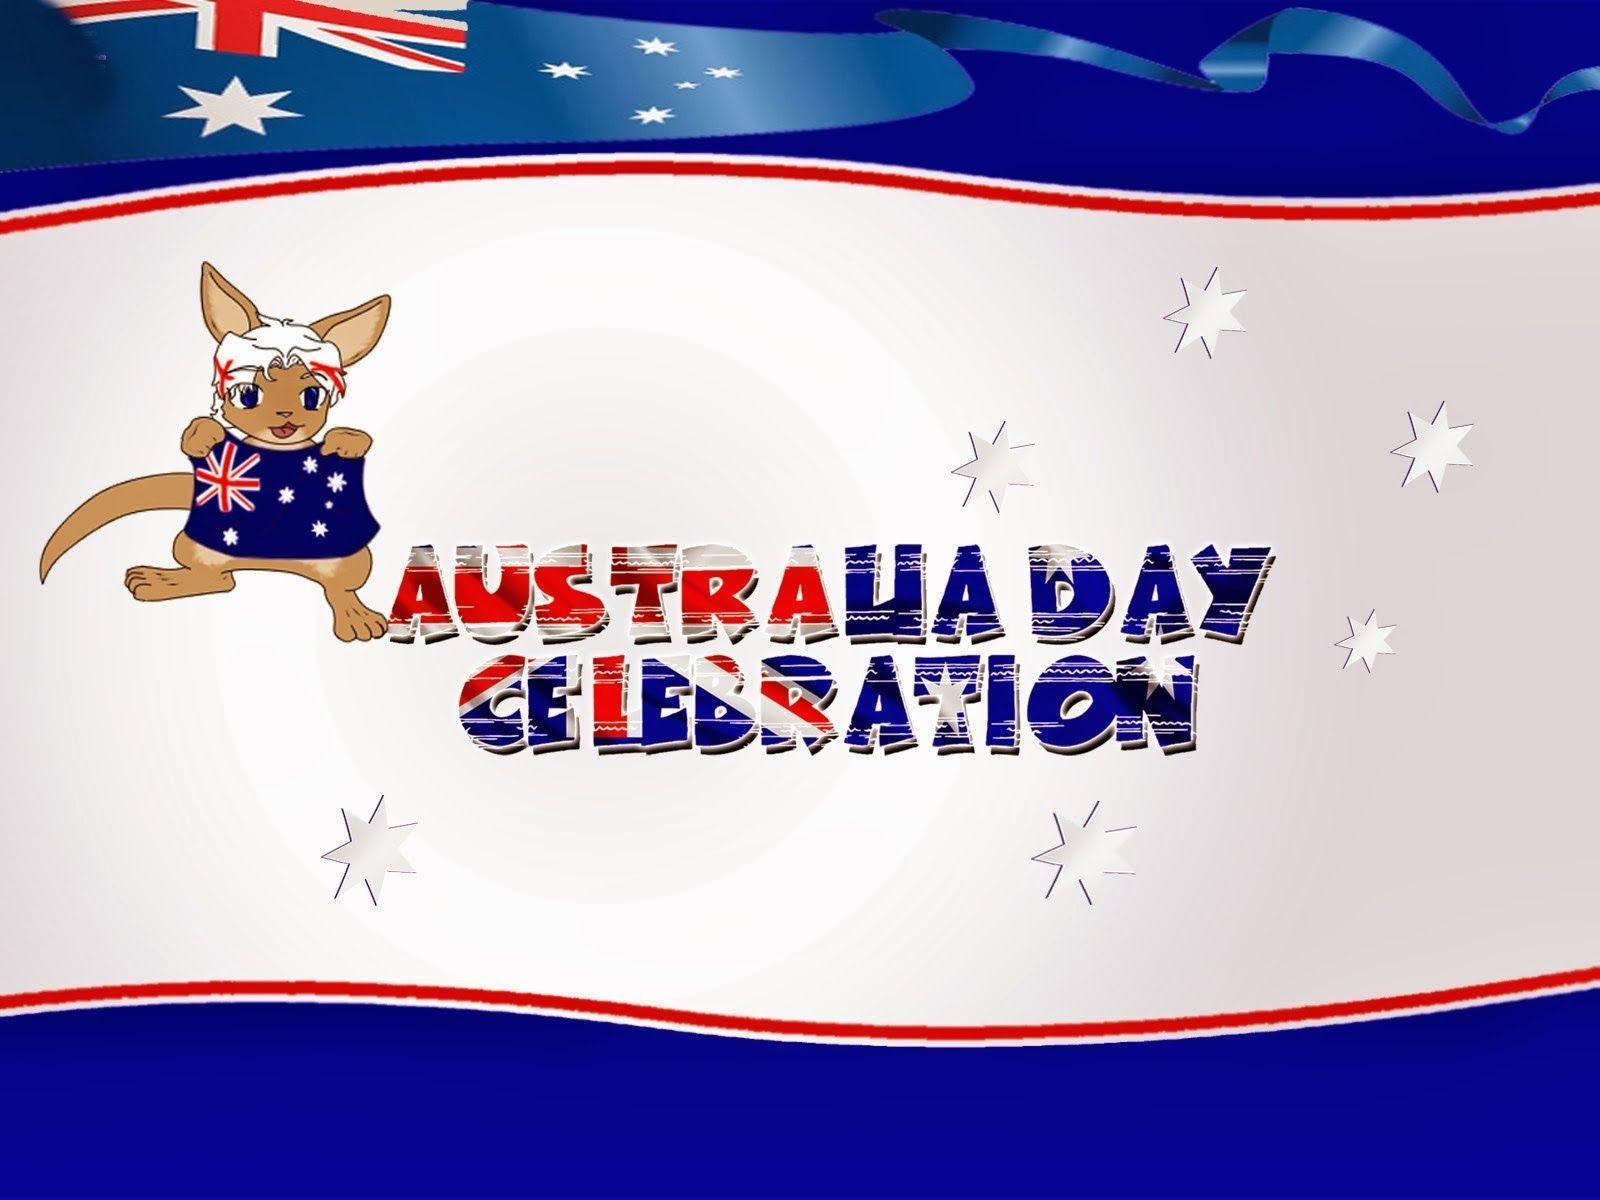 Australia Day Pictures